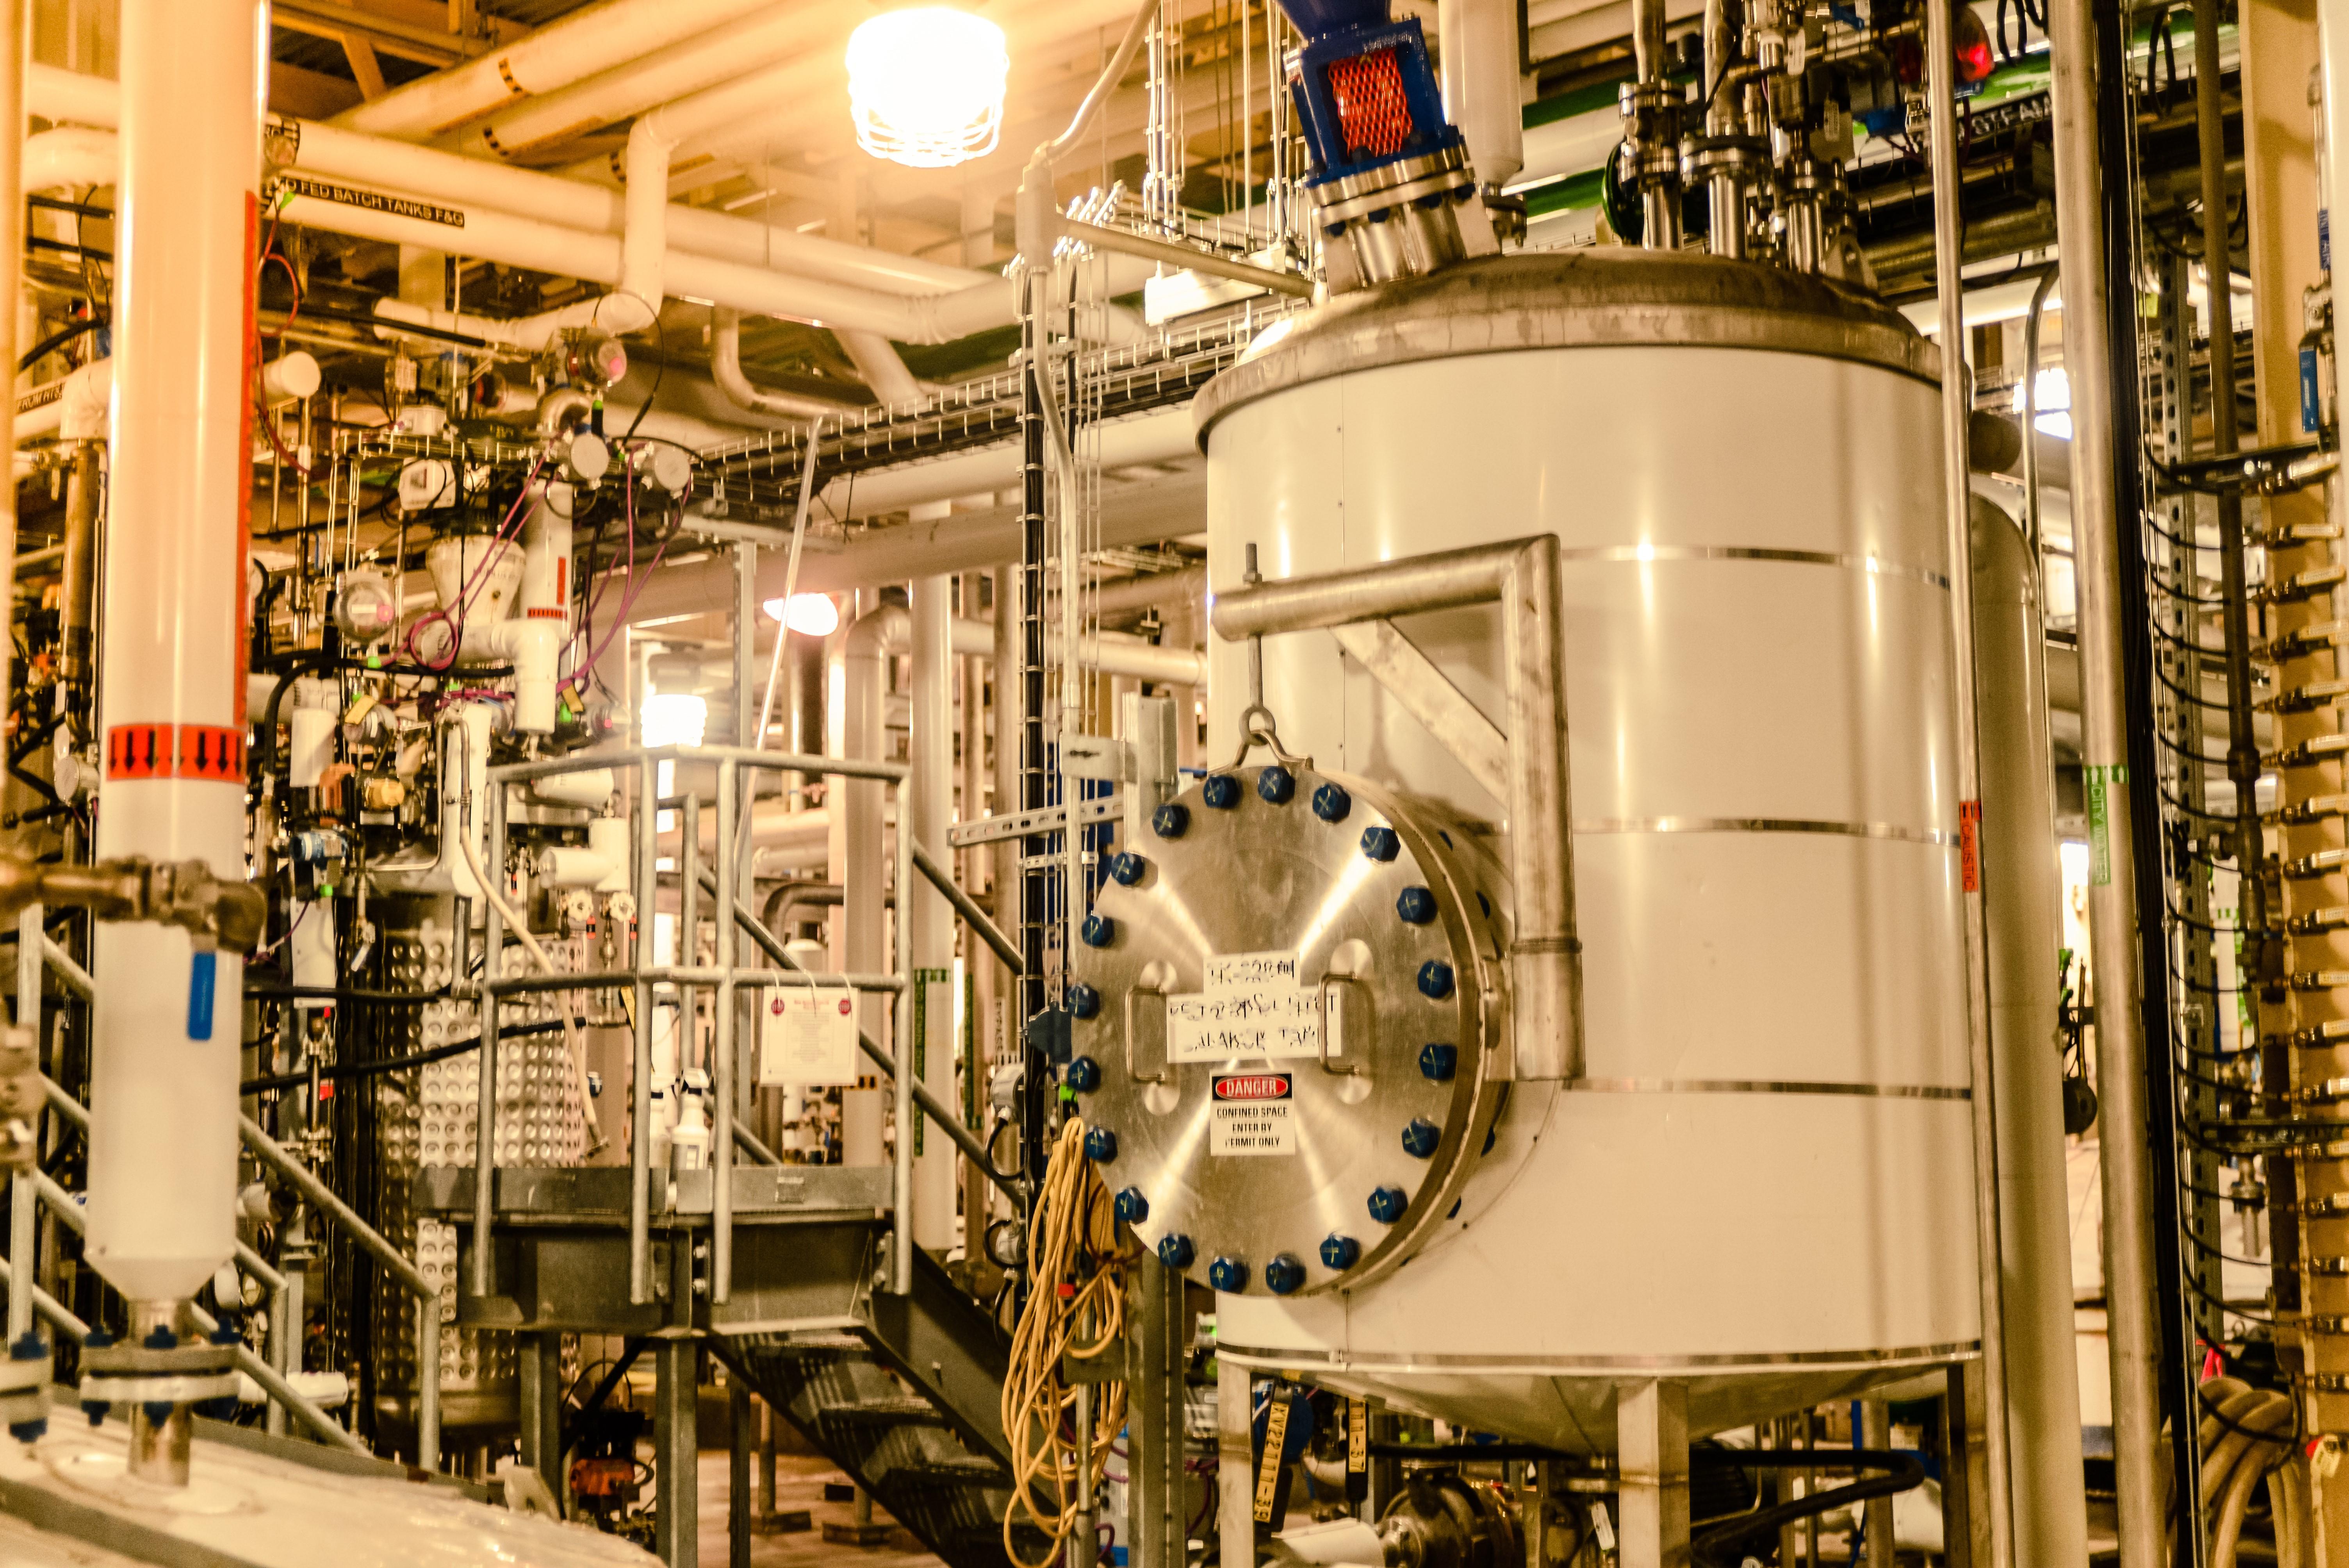 Avansya Cargill Royal DSM Eversweet fermentation facility